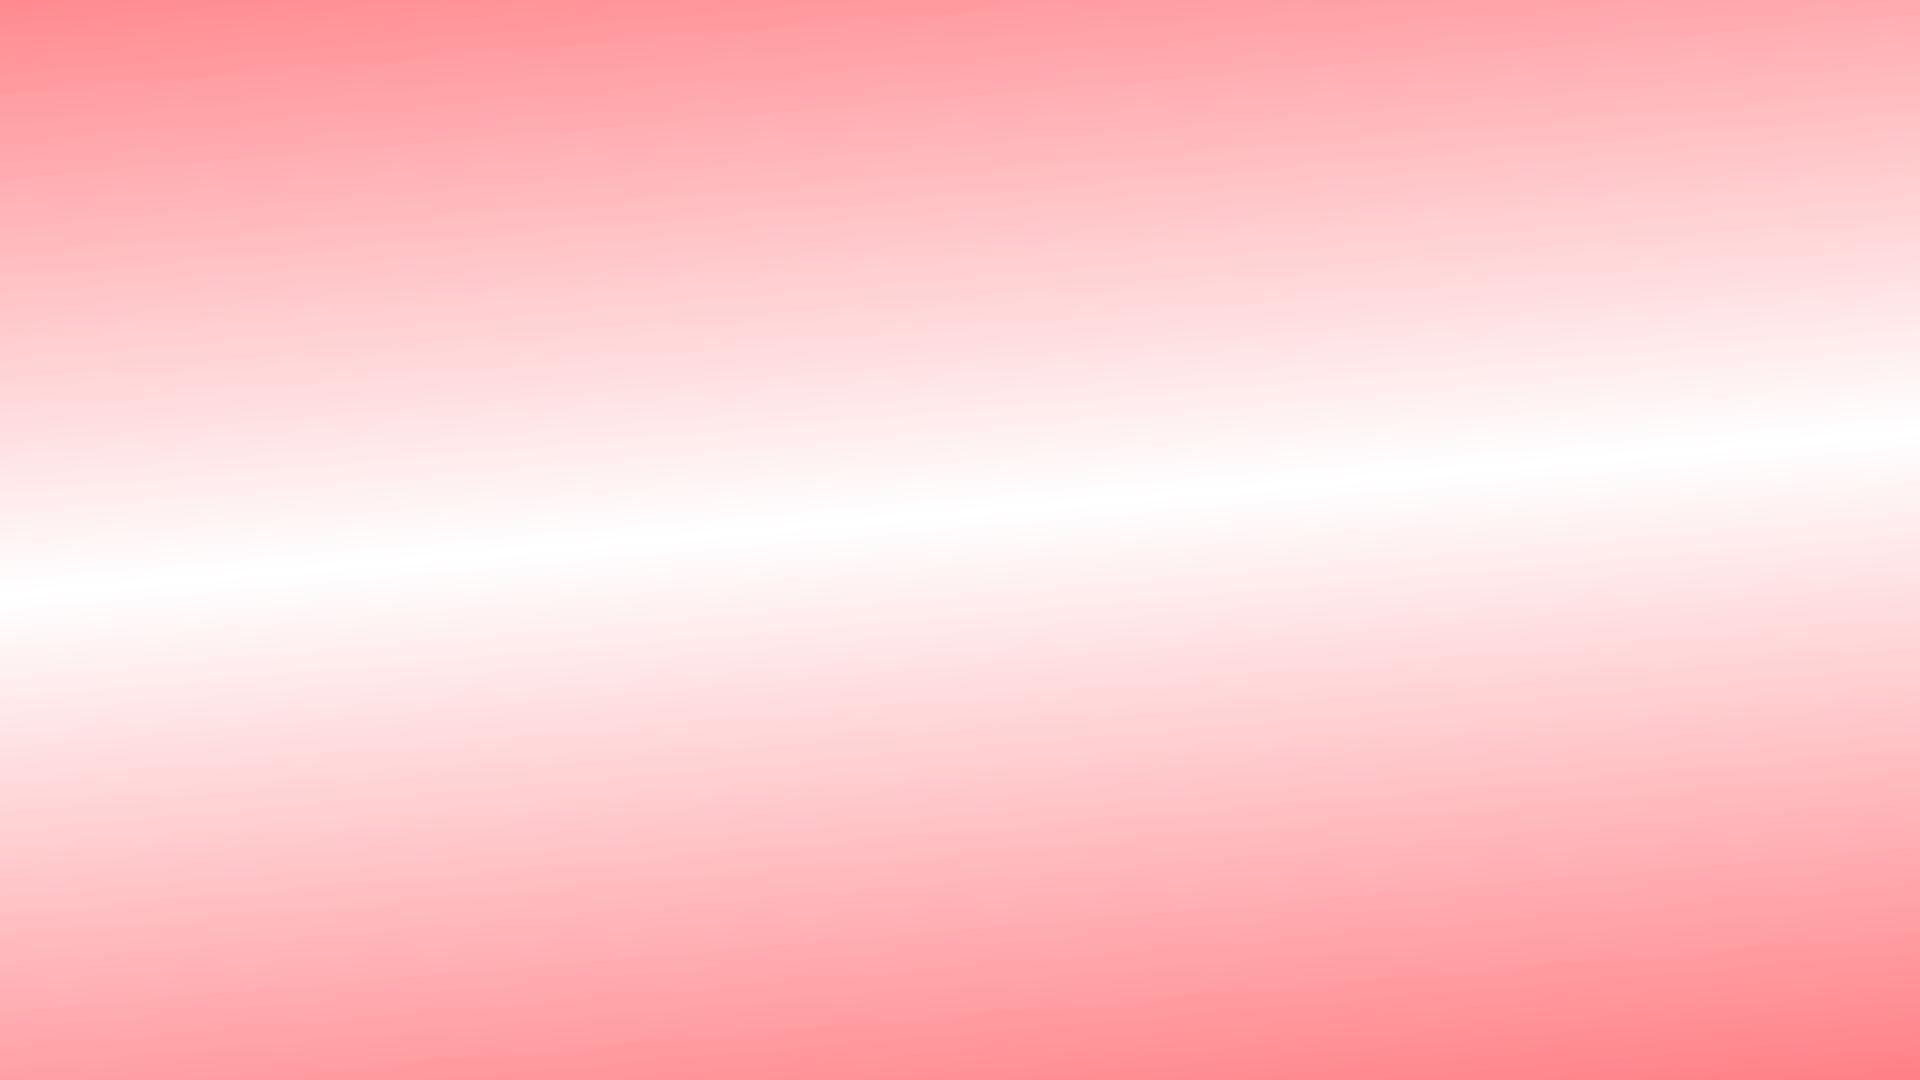 wallpaper desktop pink champagne gradient white techie 1920x1080